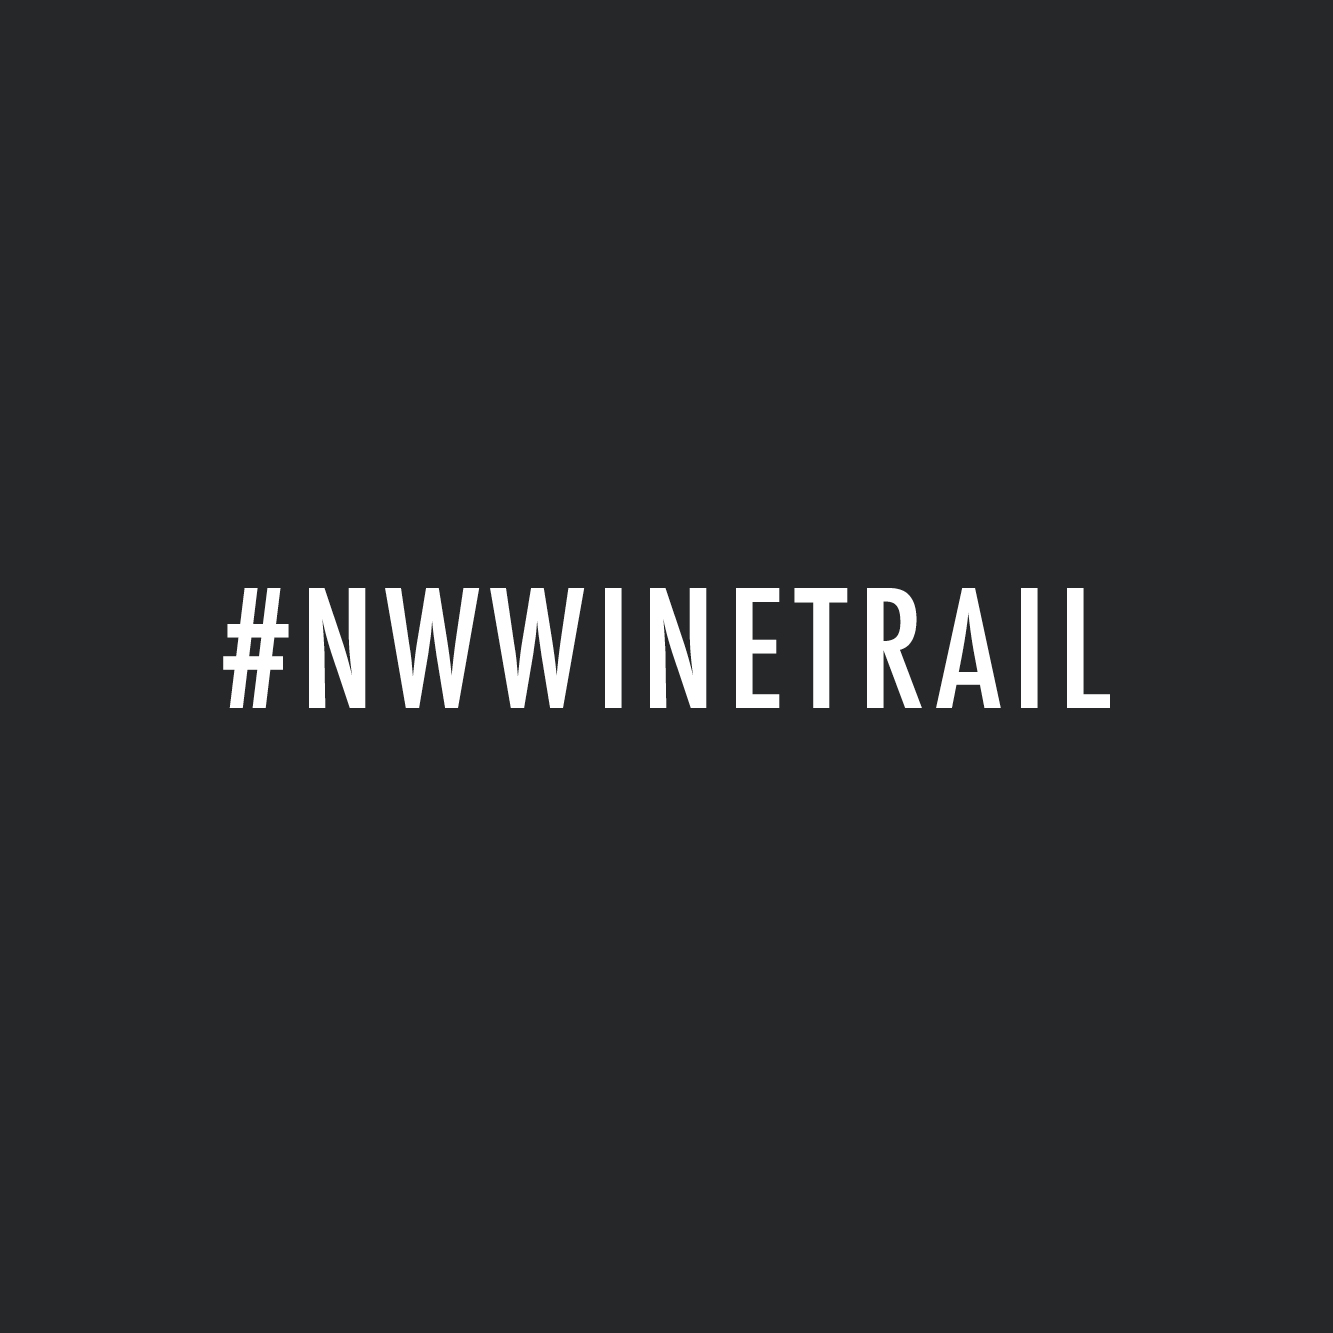 #NWWINETRAIL.jpg